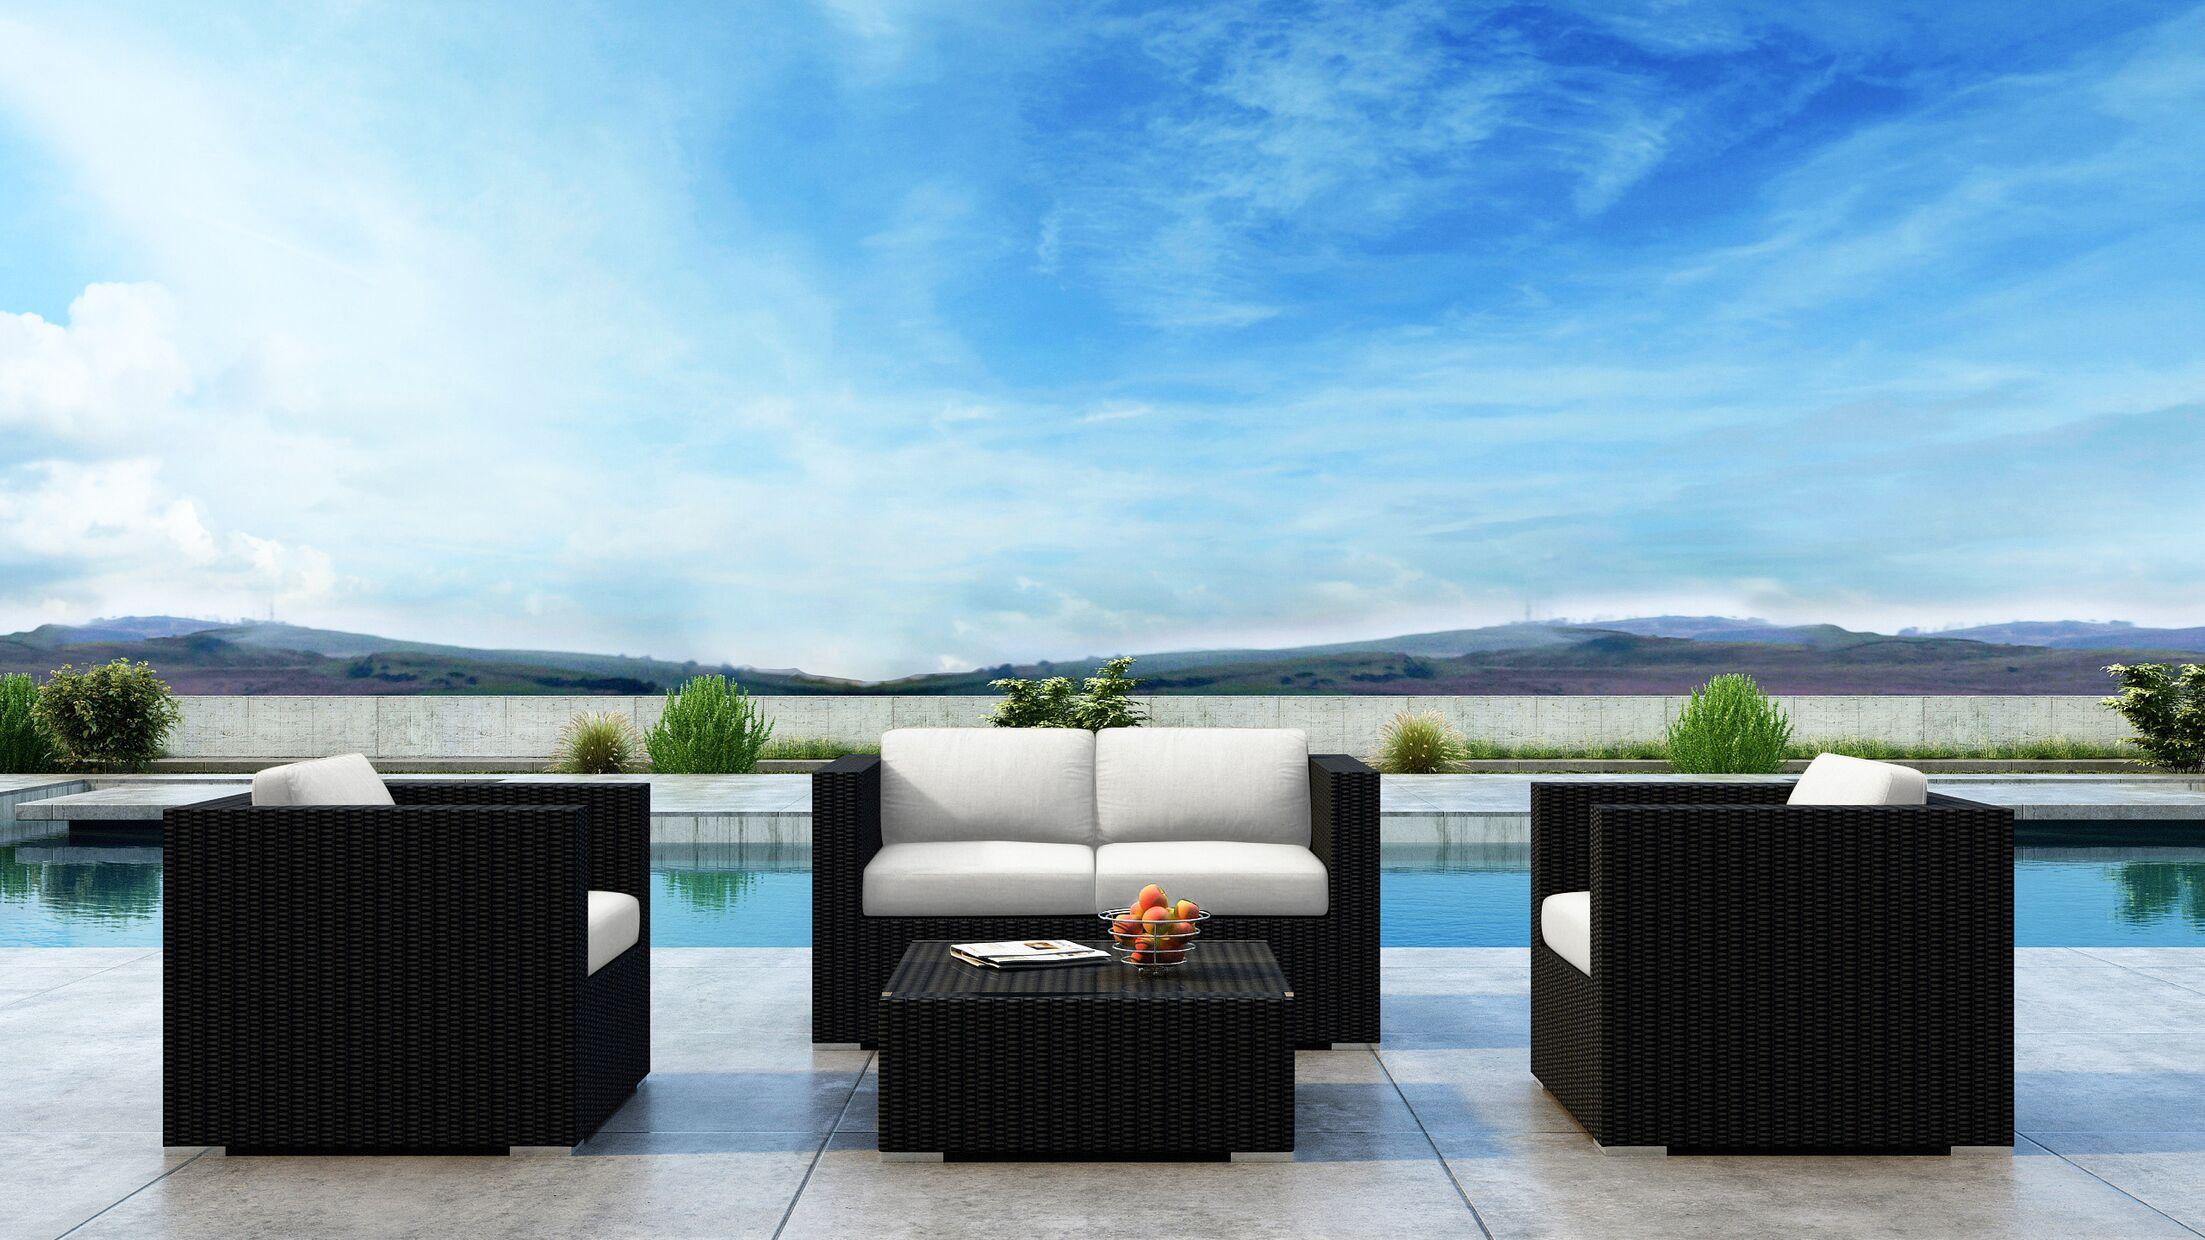 Glendale 4 Piece Sofa Set with Sunbrella Cushion Cushion Color: Canvas Natural